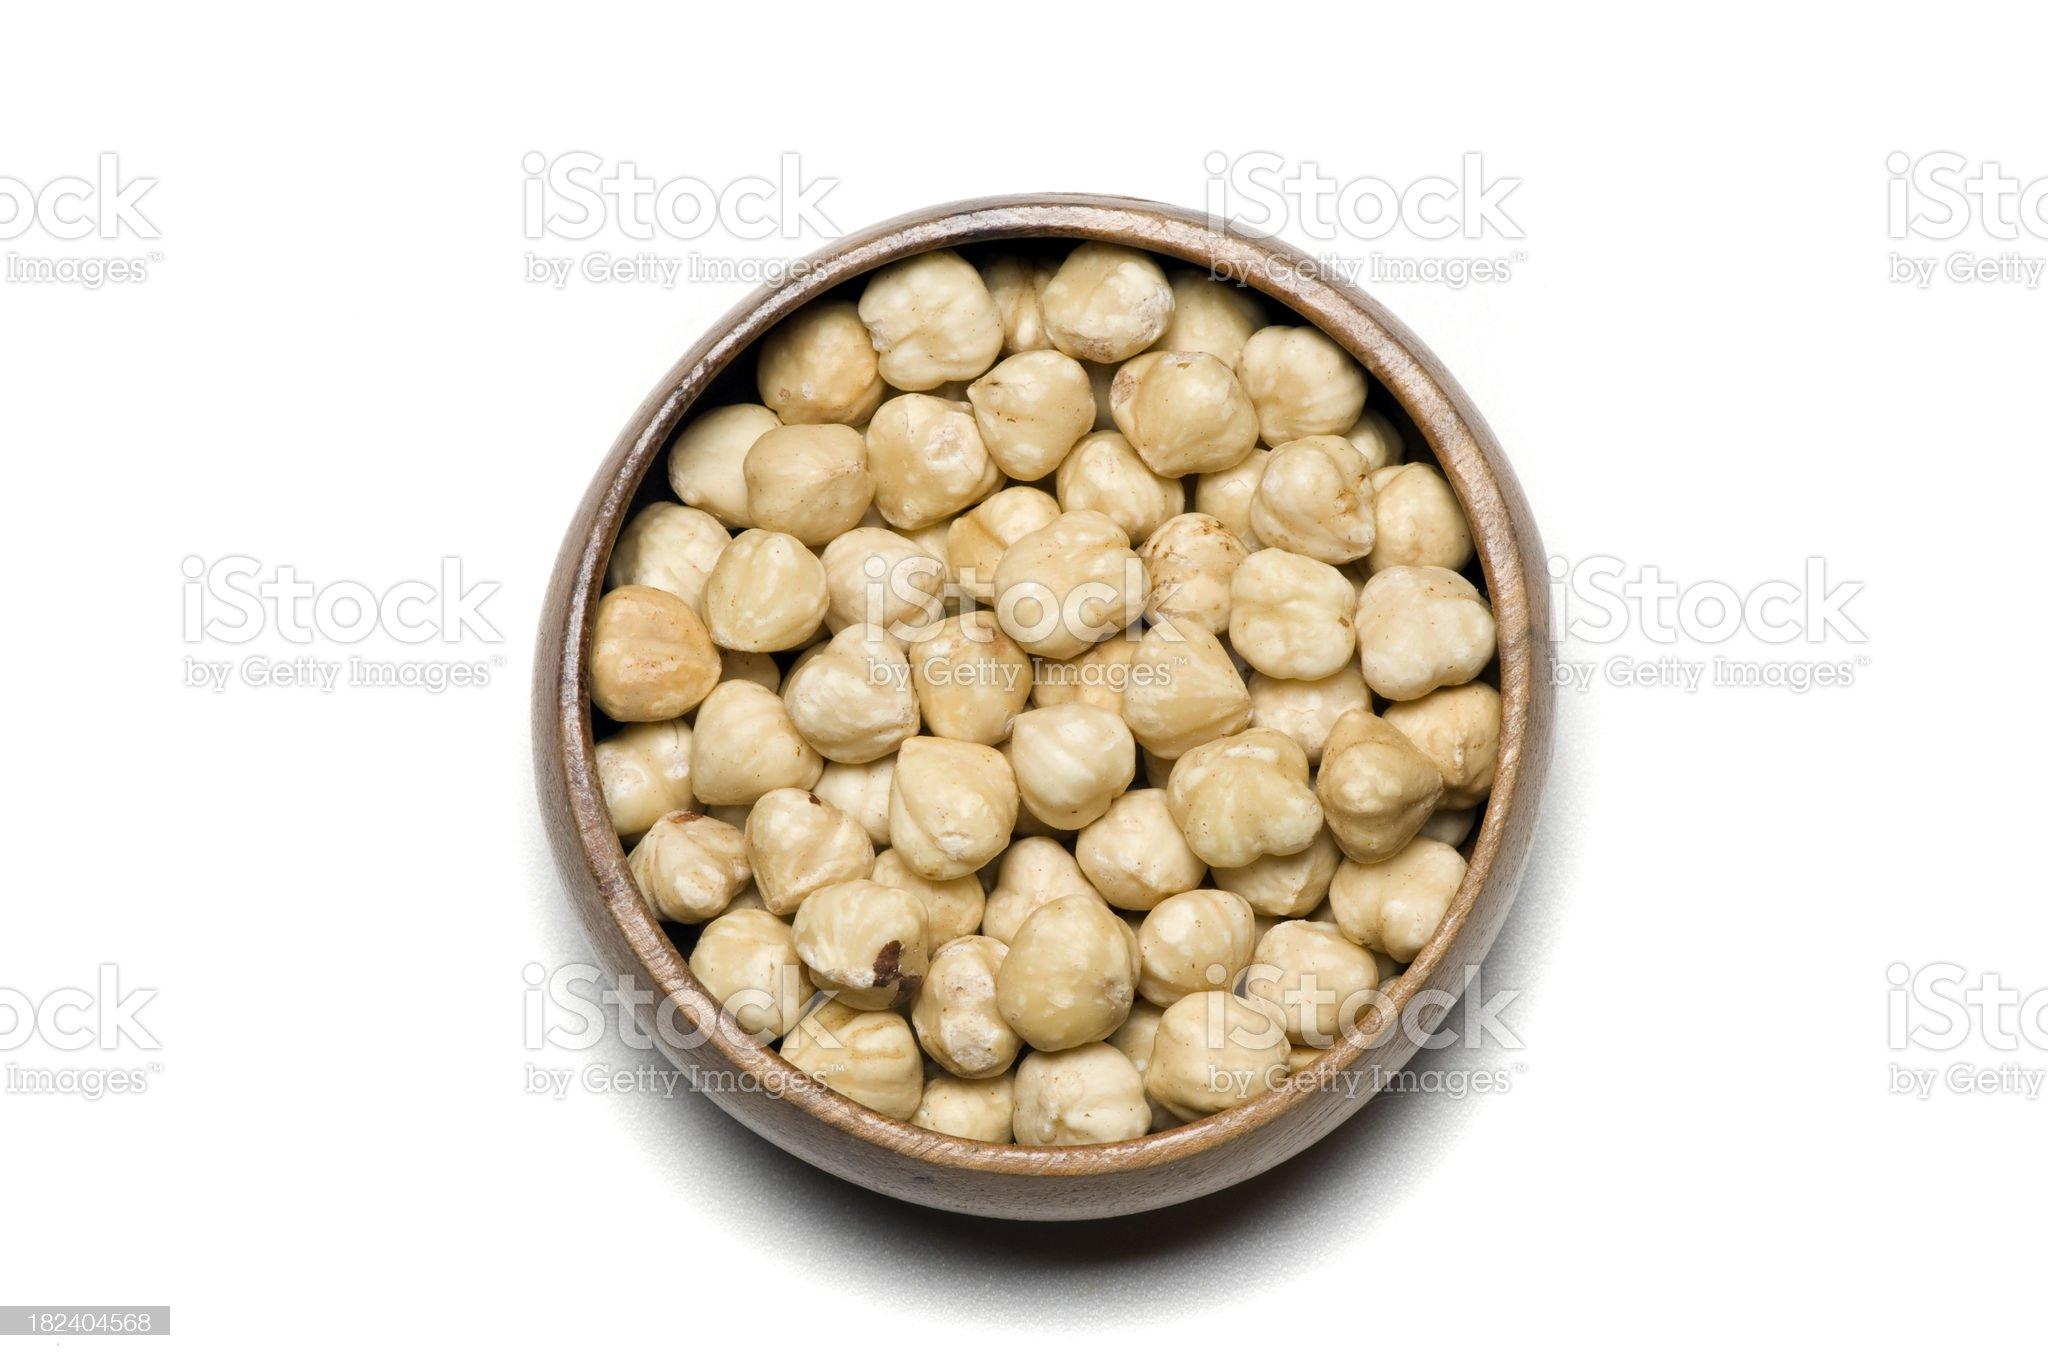 Bowl of hazel nuts royalty-free stock photo